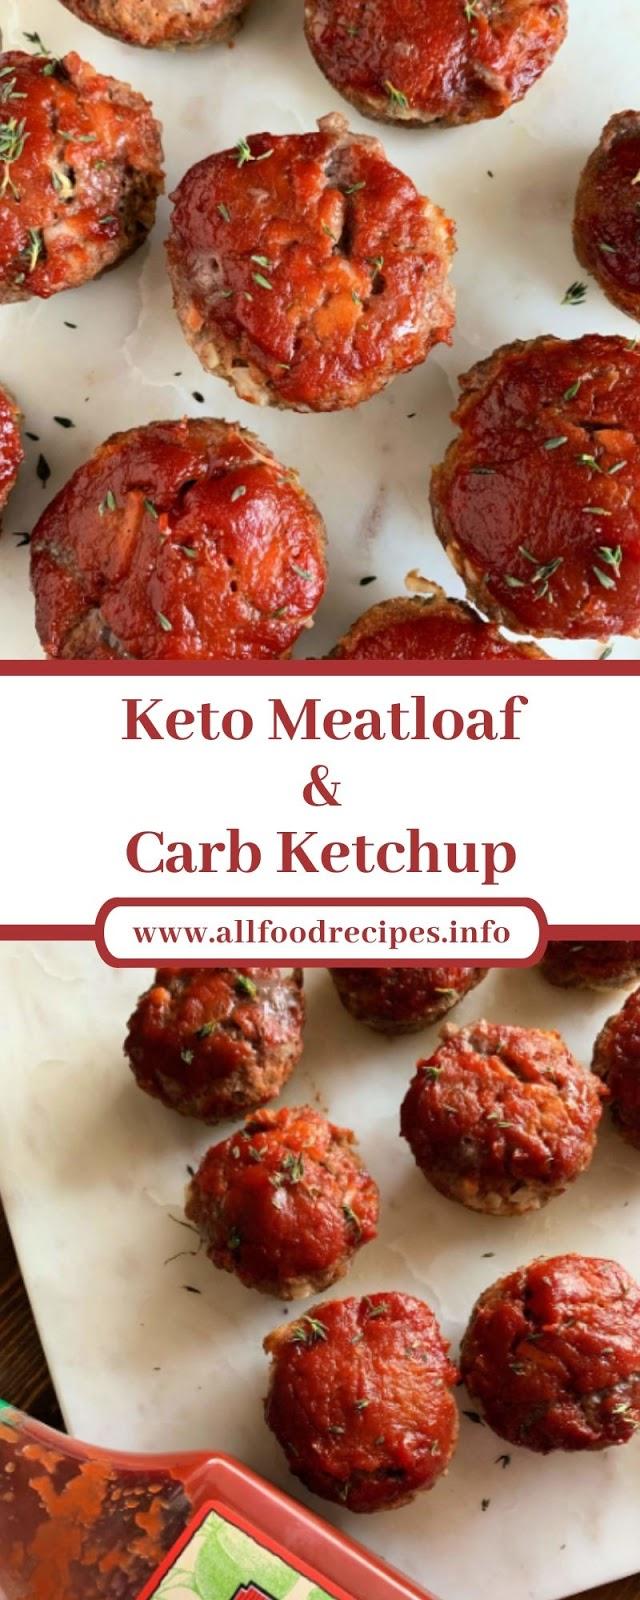 Keto Meatloaf & Carb Ketchup